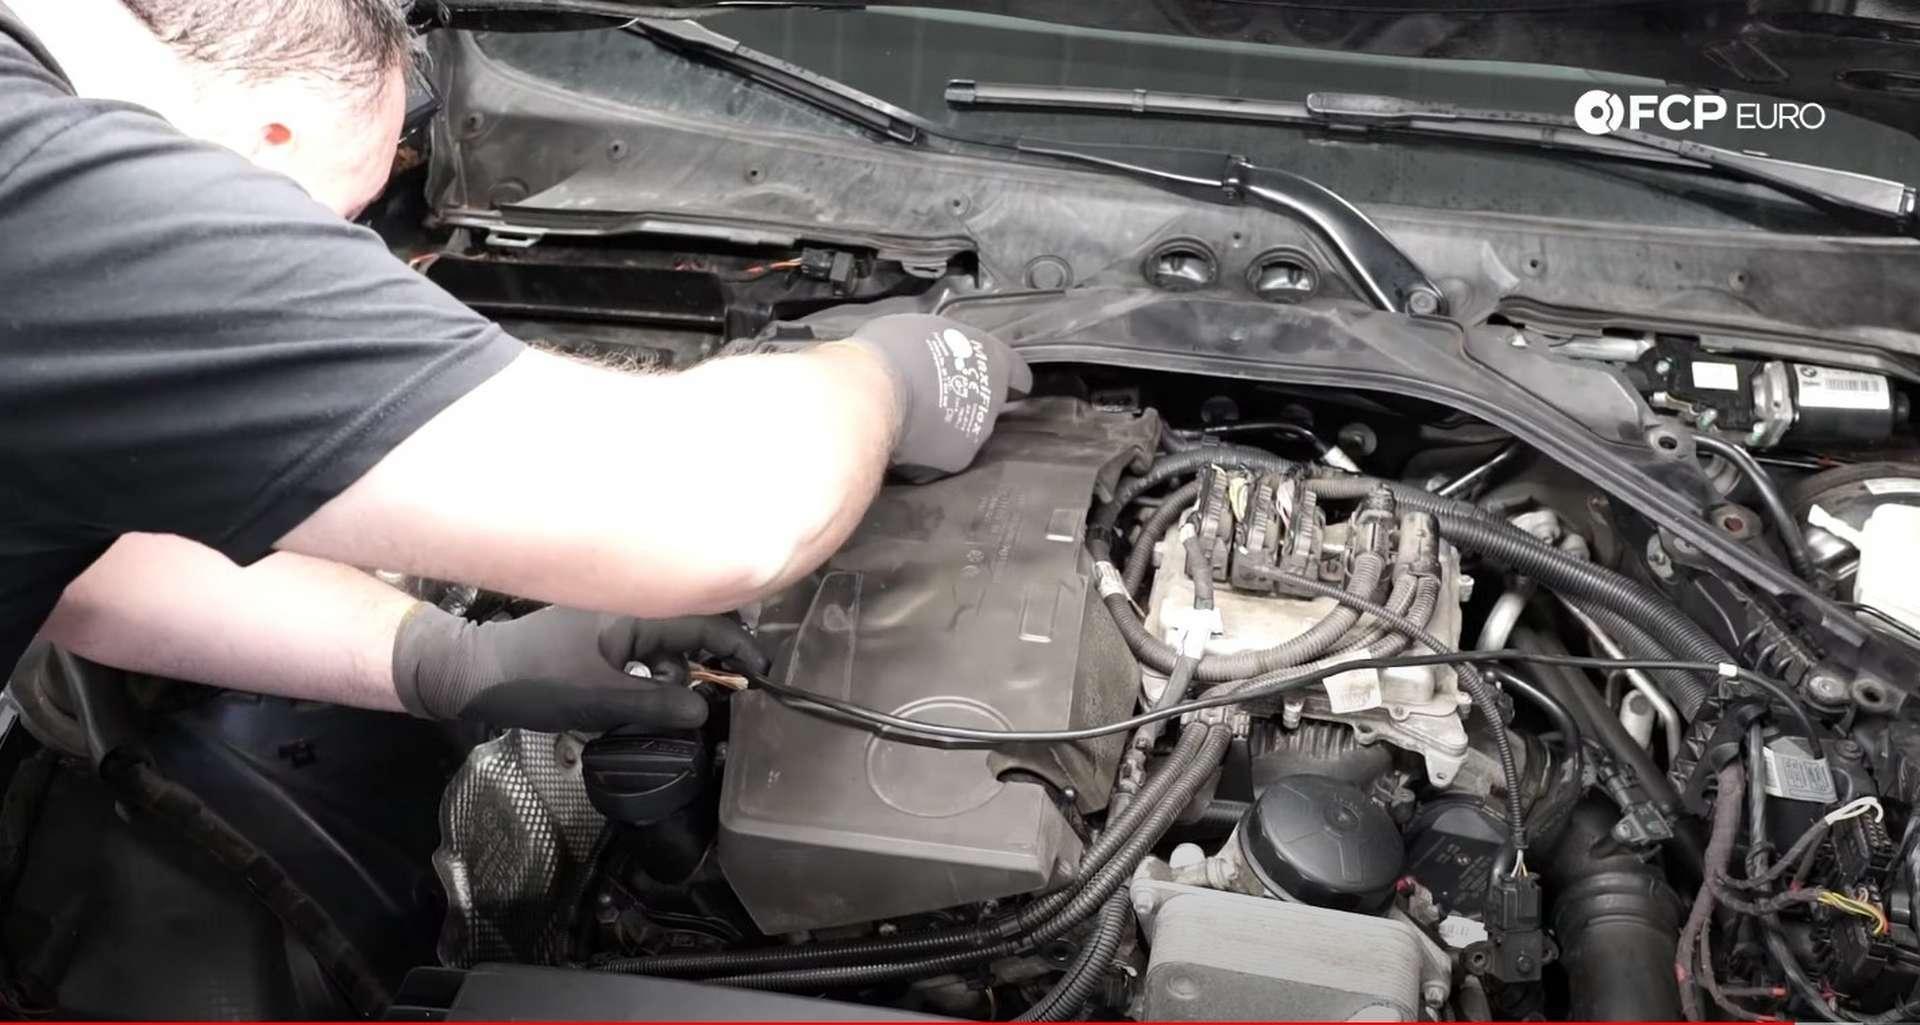 21-DIY-BMW-F30-High-Pressure-Fuel-Pump-Replacement_Refitting-Plastics